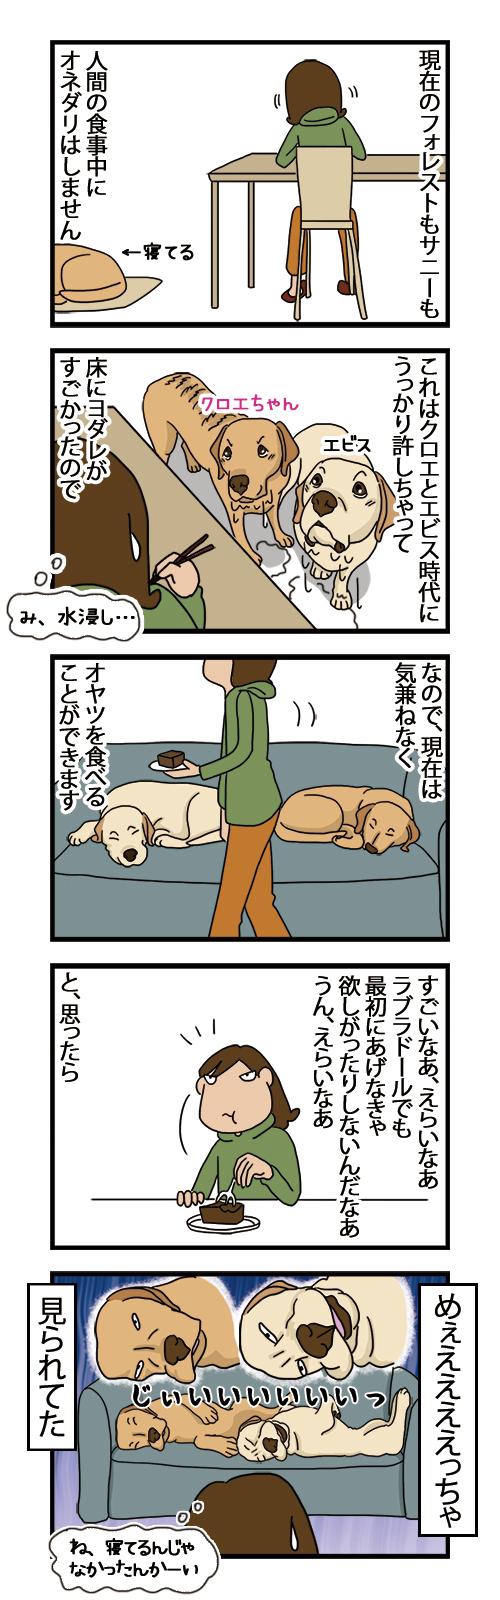 09062021_dogcomic.jpg